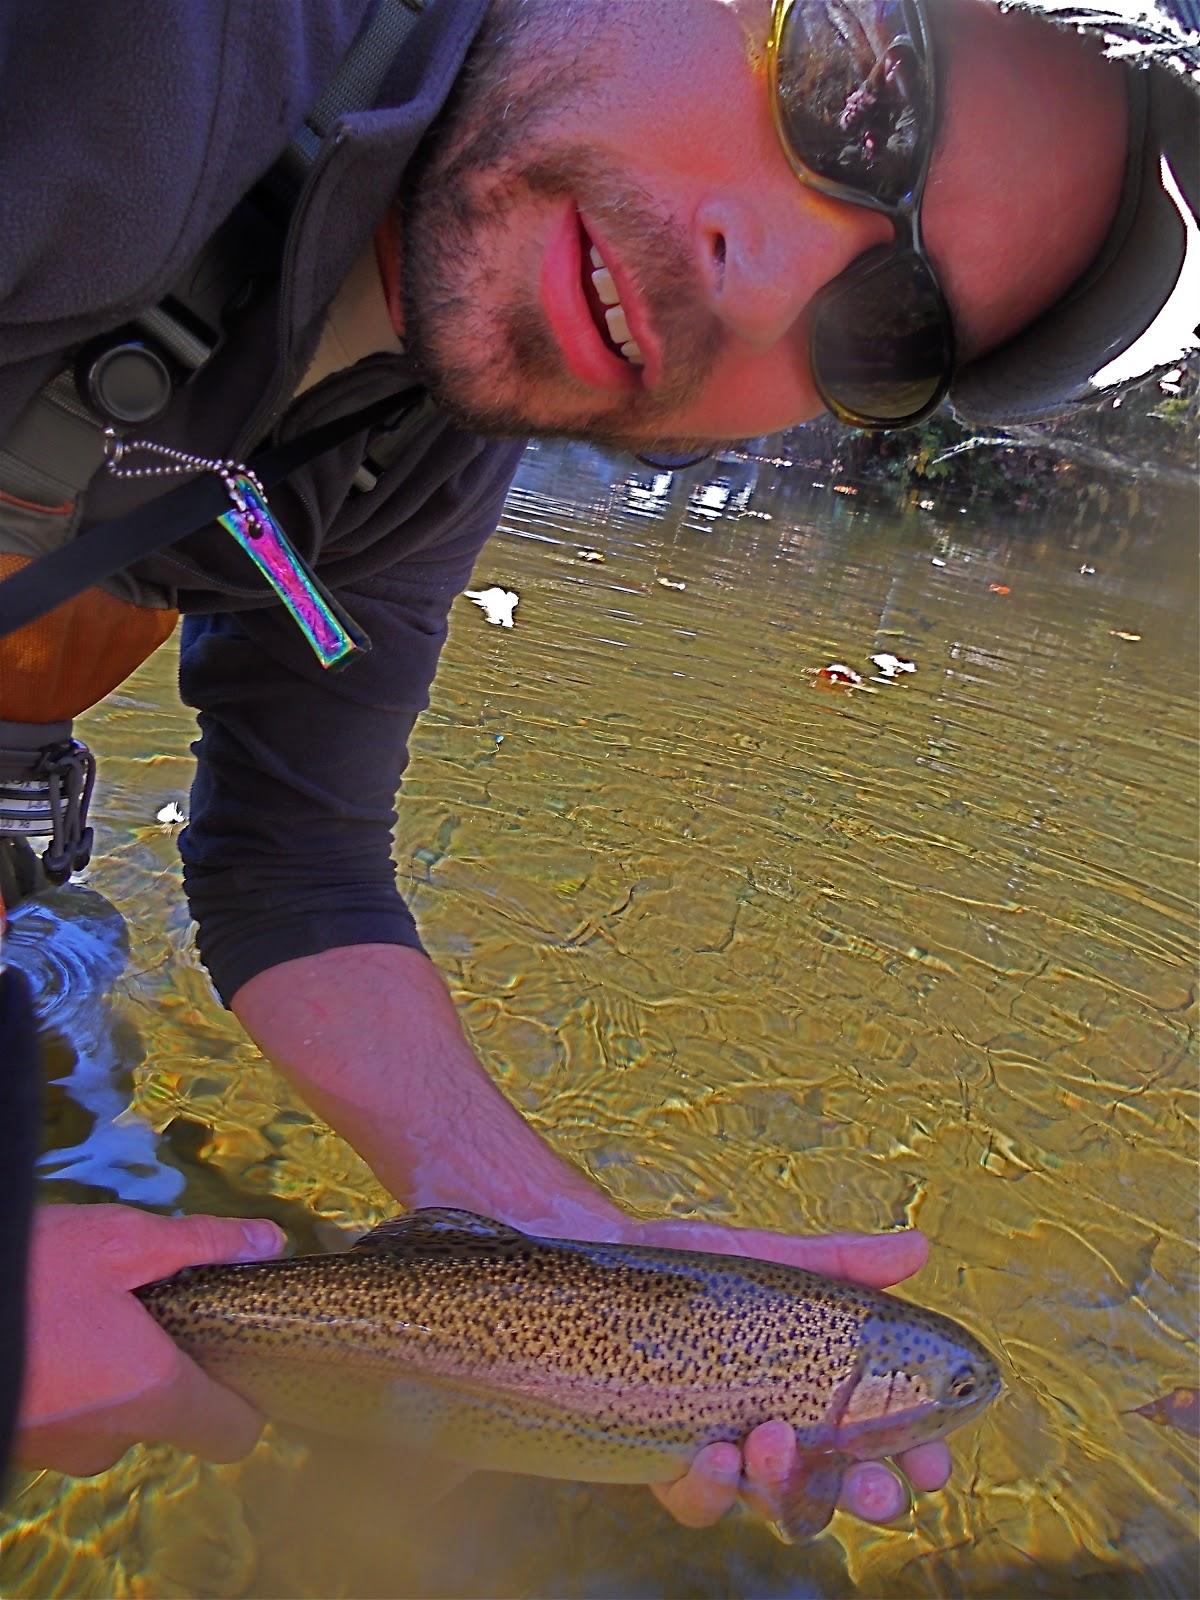 Lance milks fly fishing fishing with sydney for Sjfc fish r net